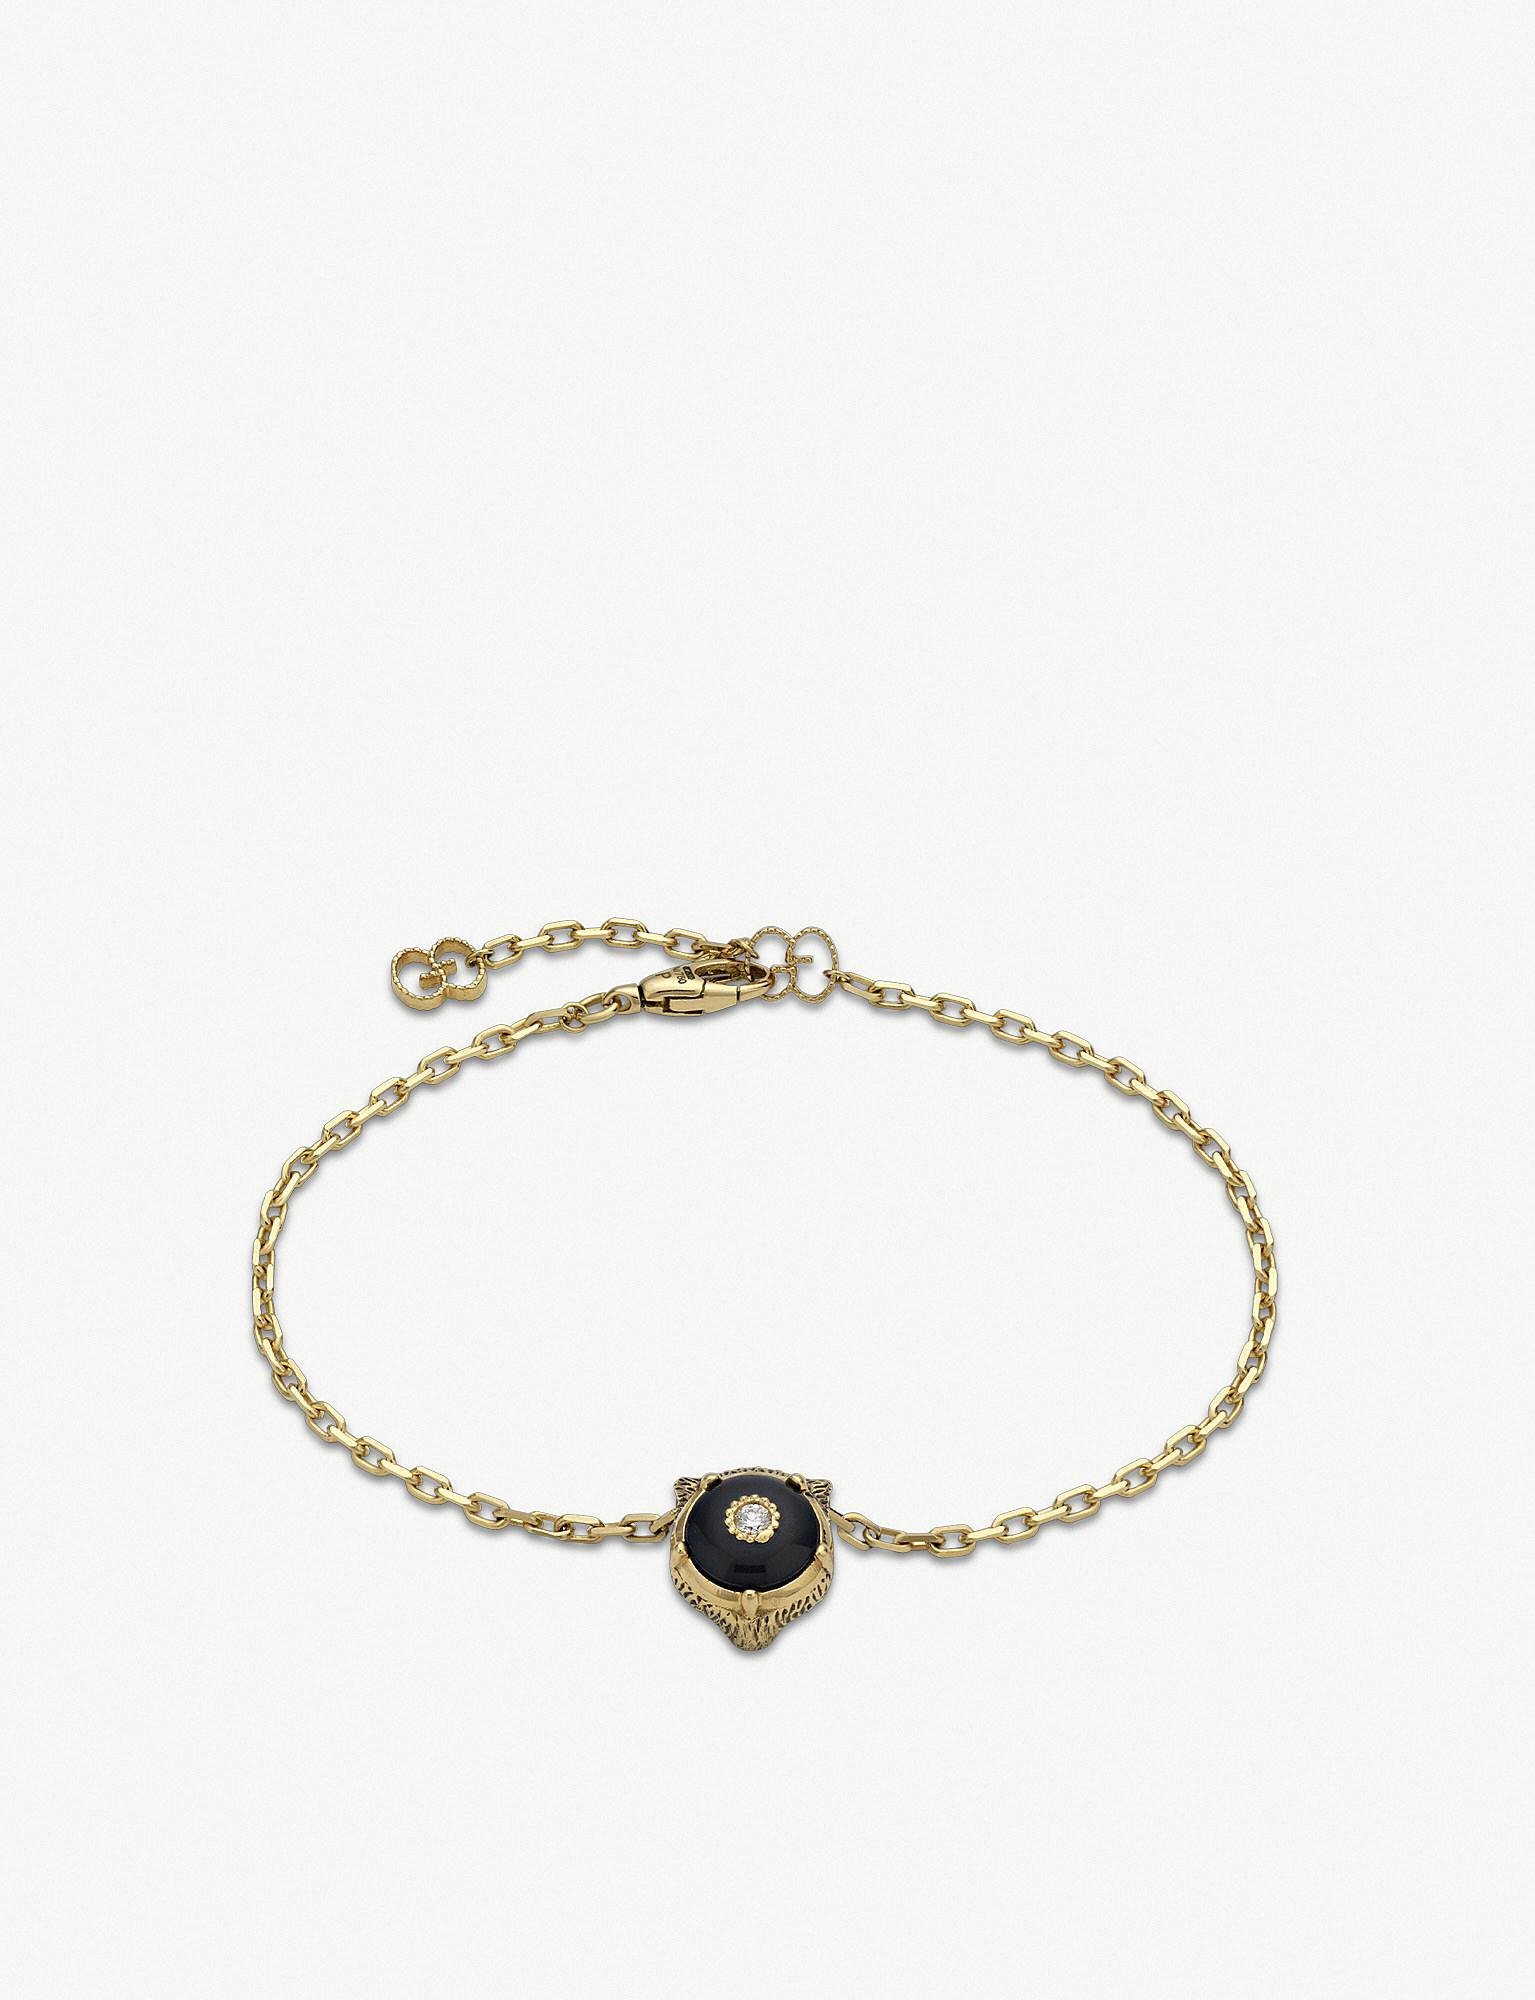 501fb05f826 Lyst - Gucci Le Marché Des Merveilles 18ct Yellow-gold in Metallic